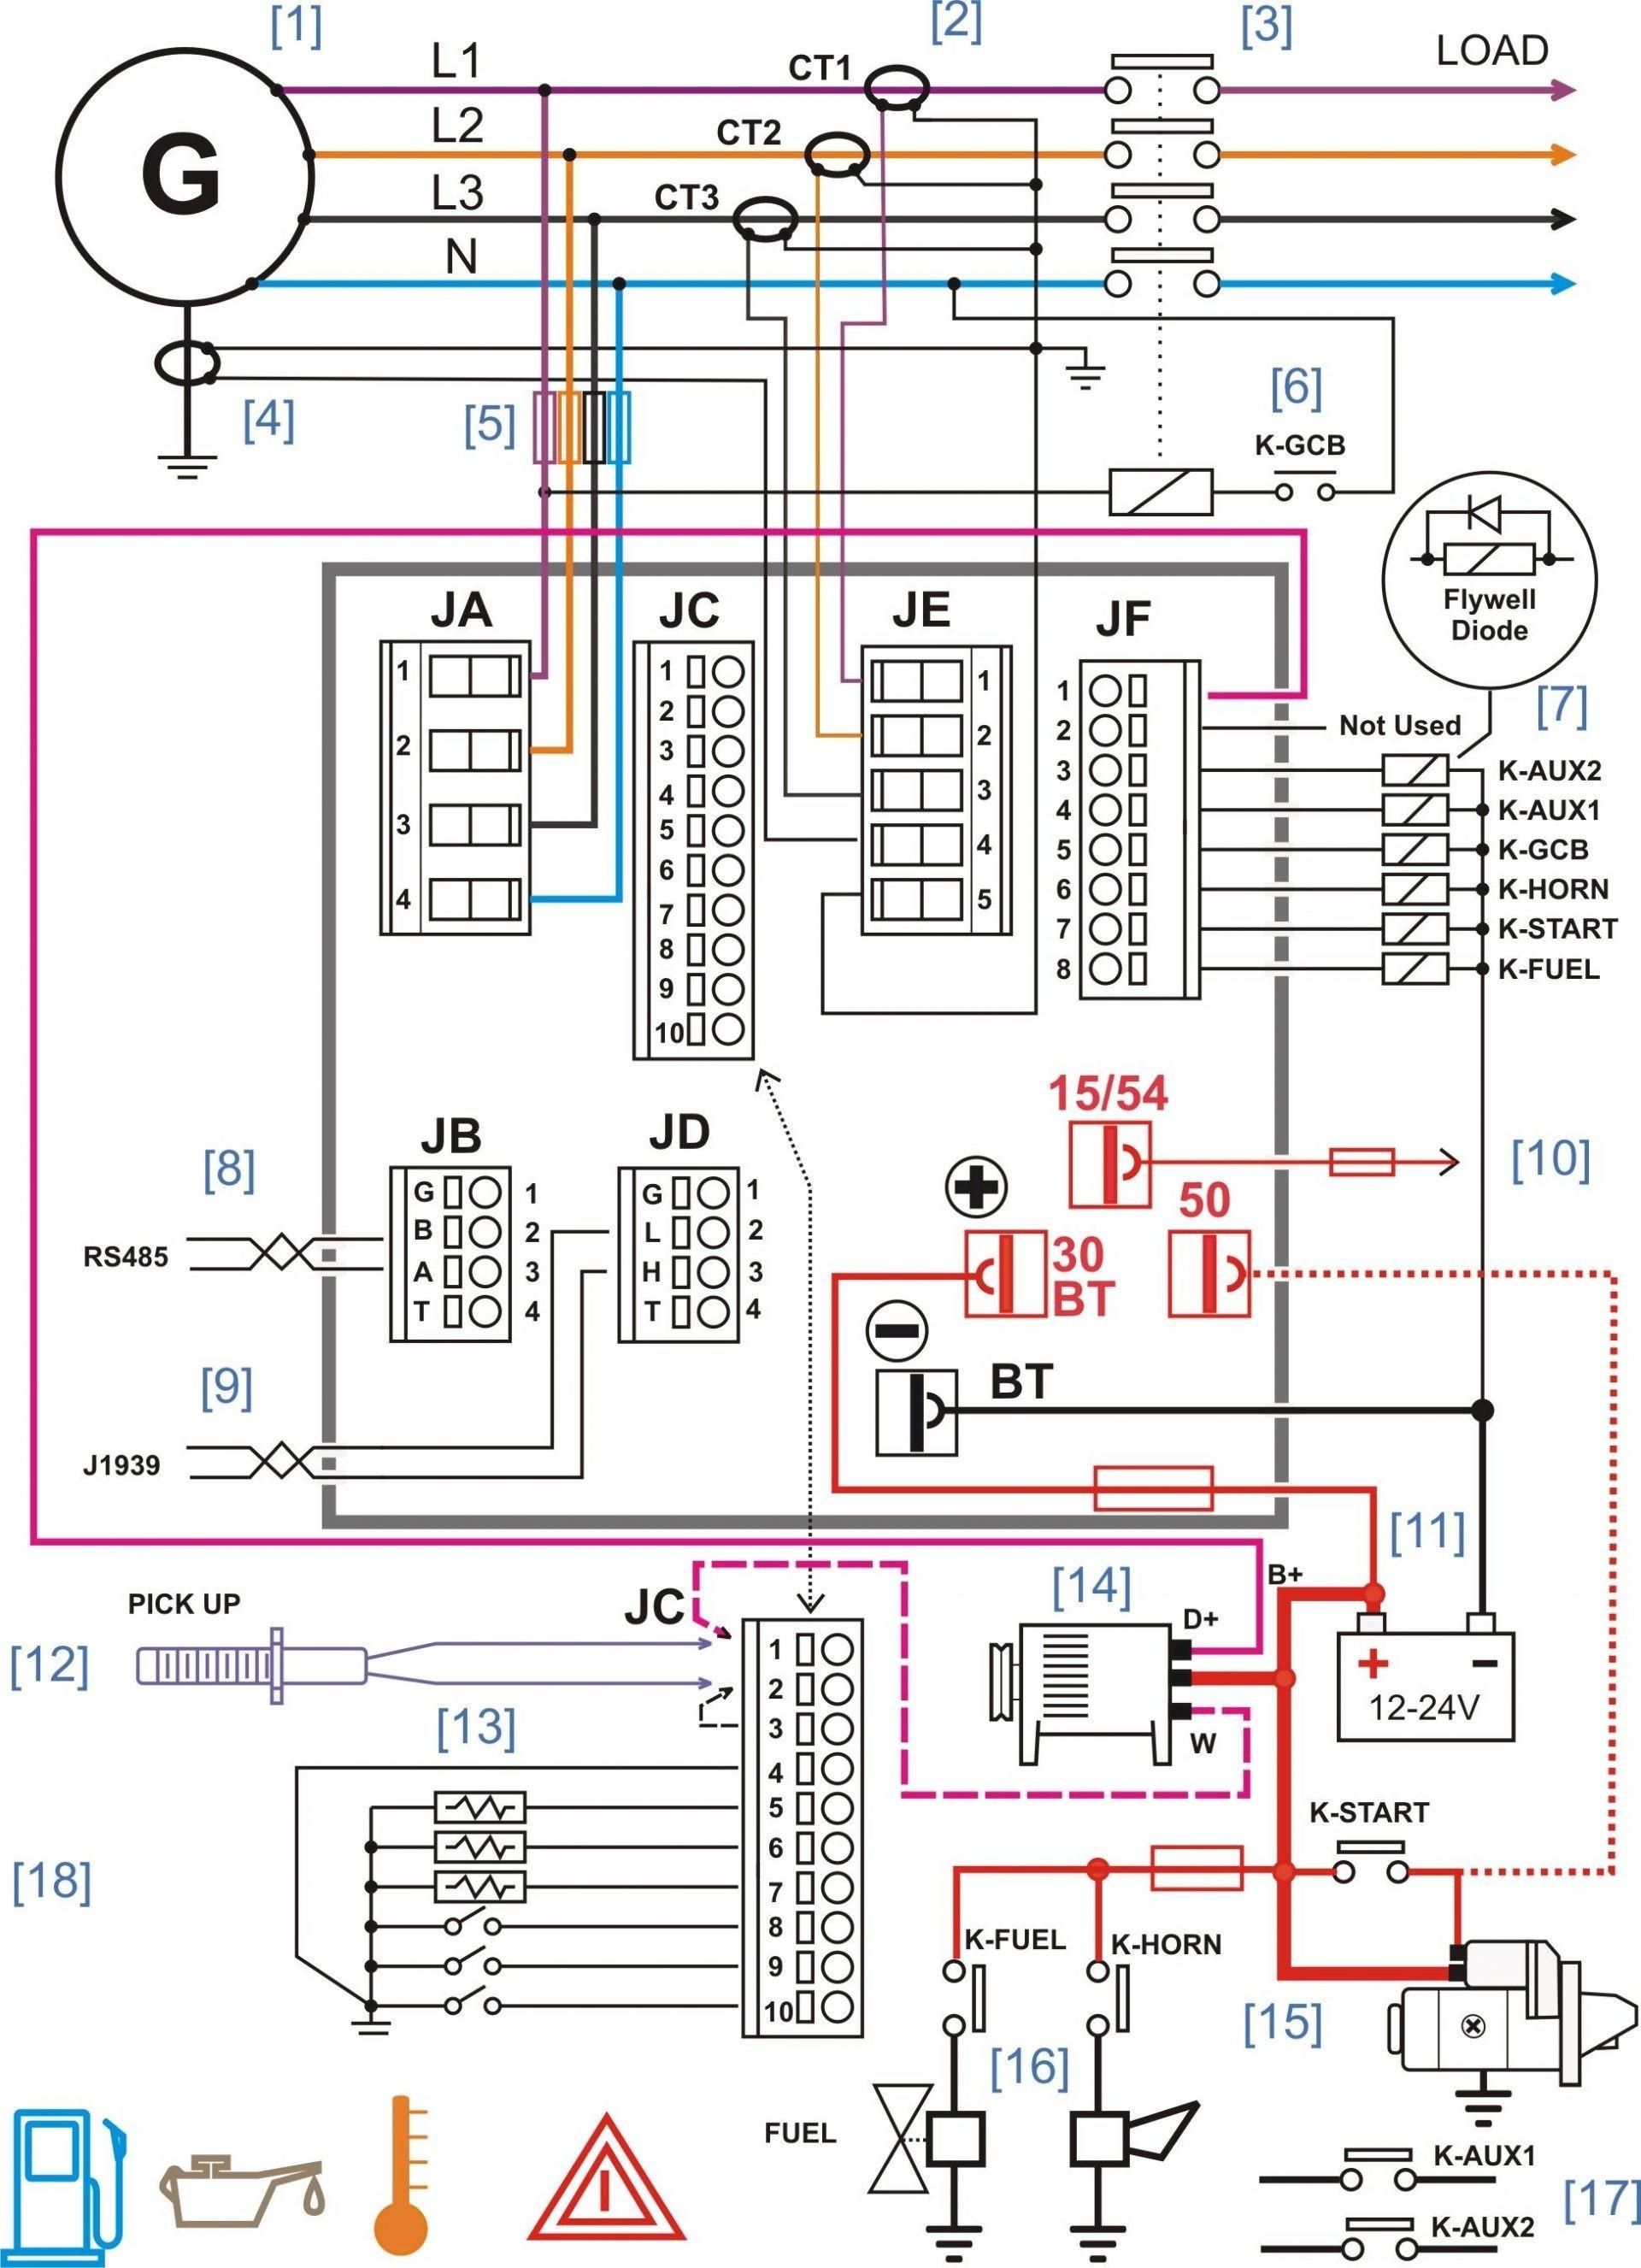 rv distribution panel wiring diagram